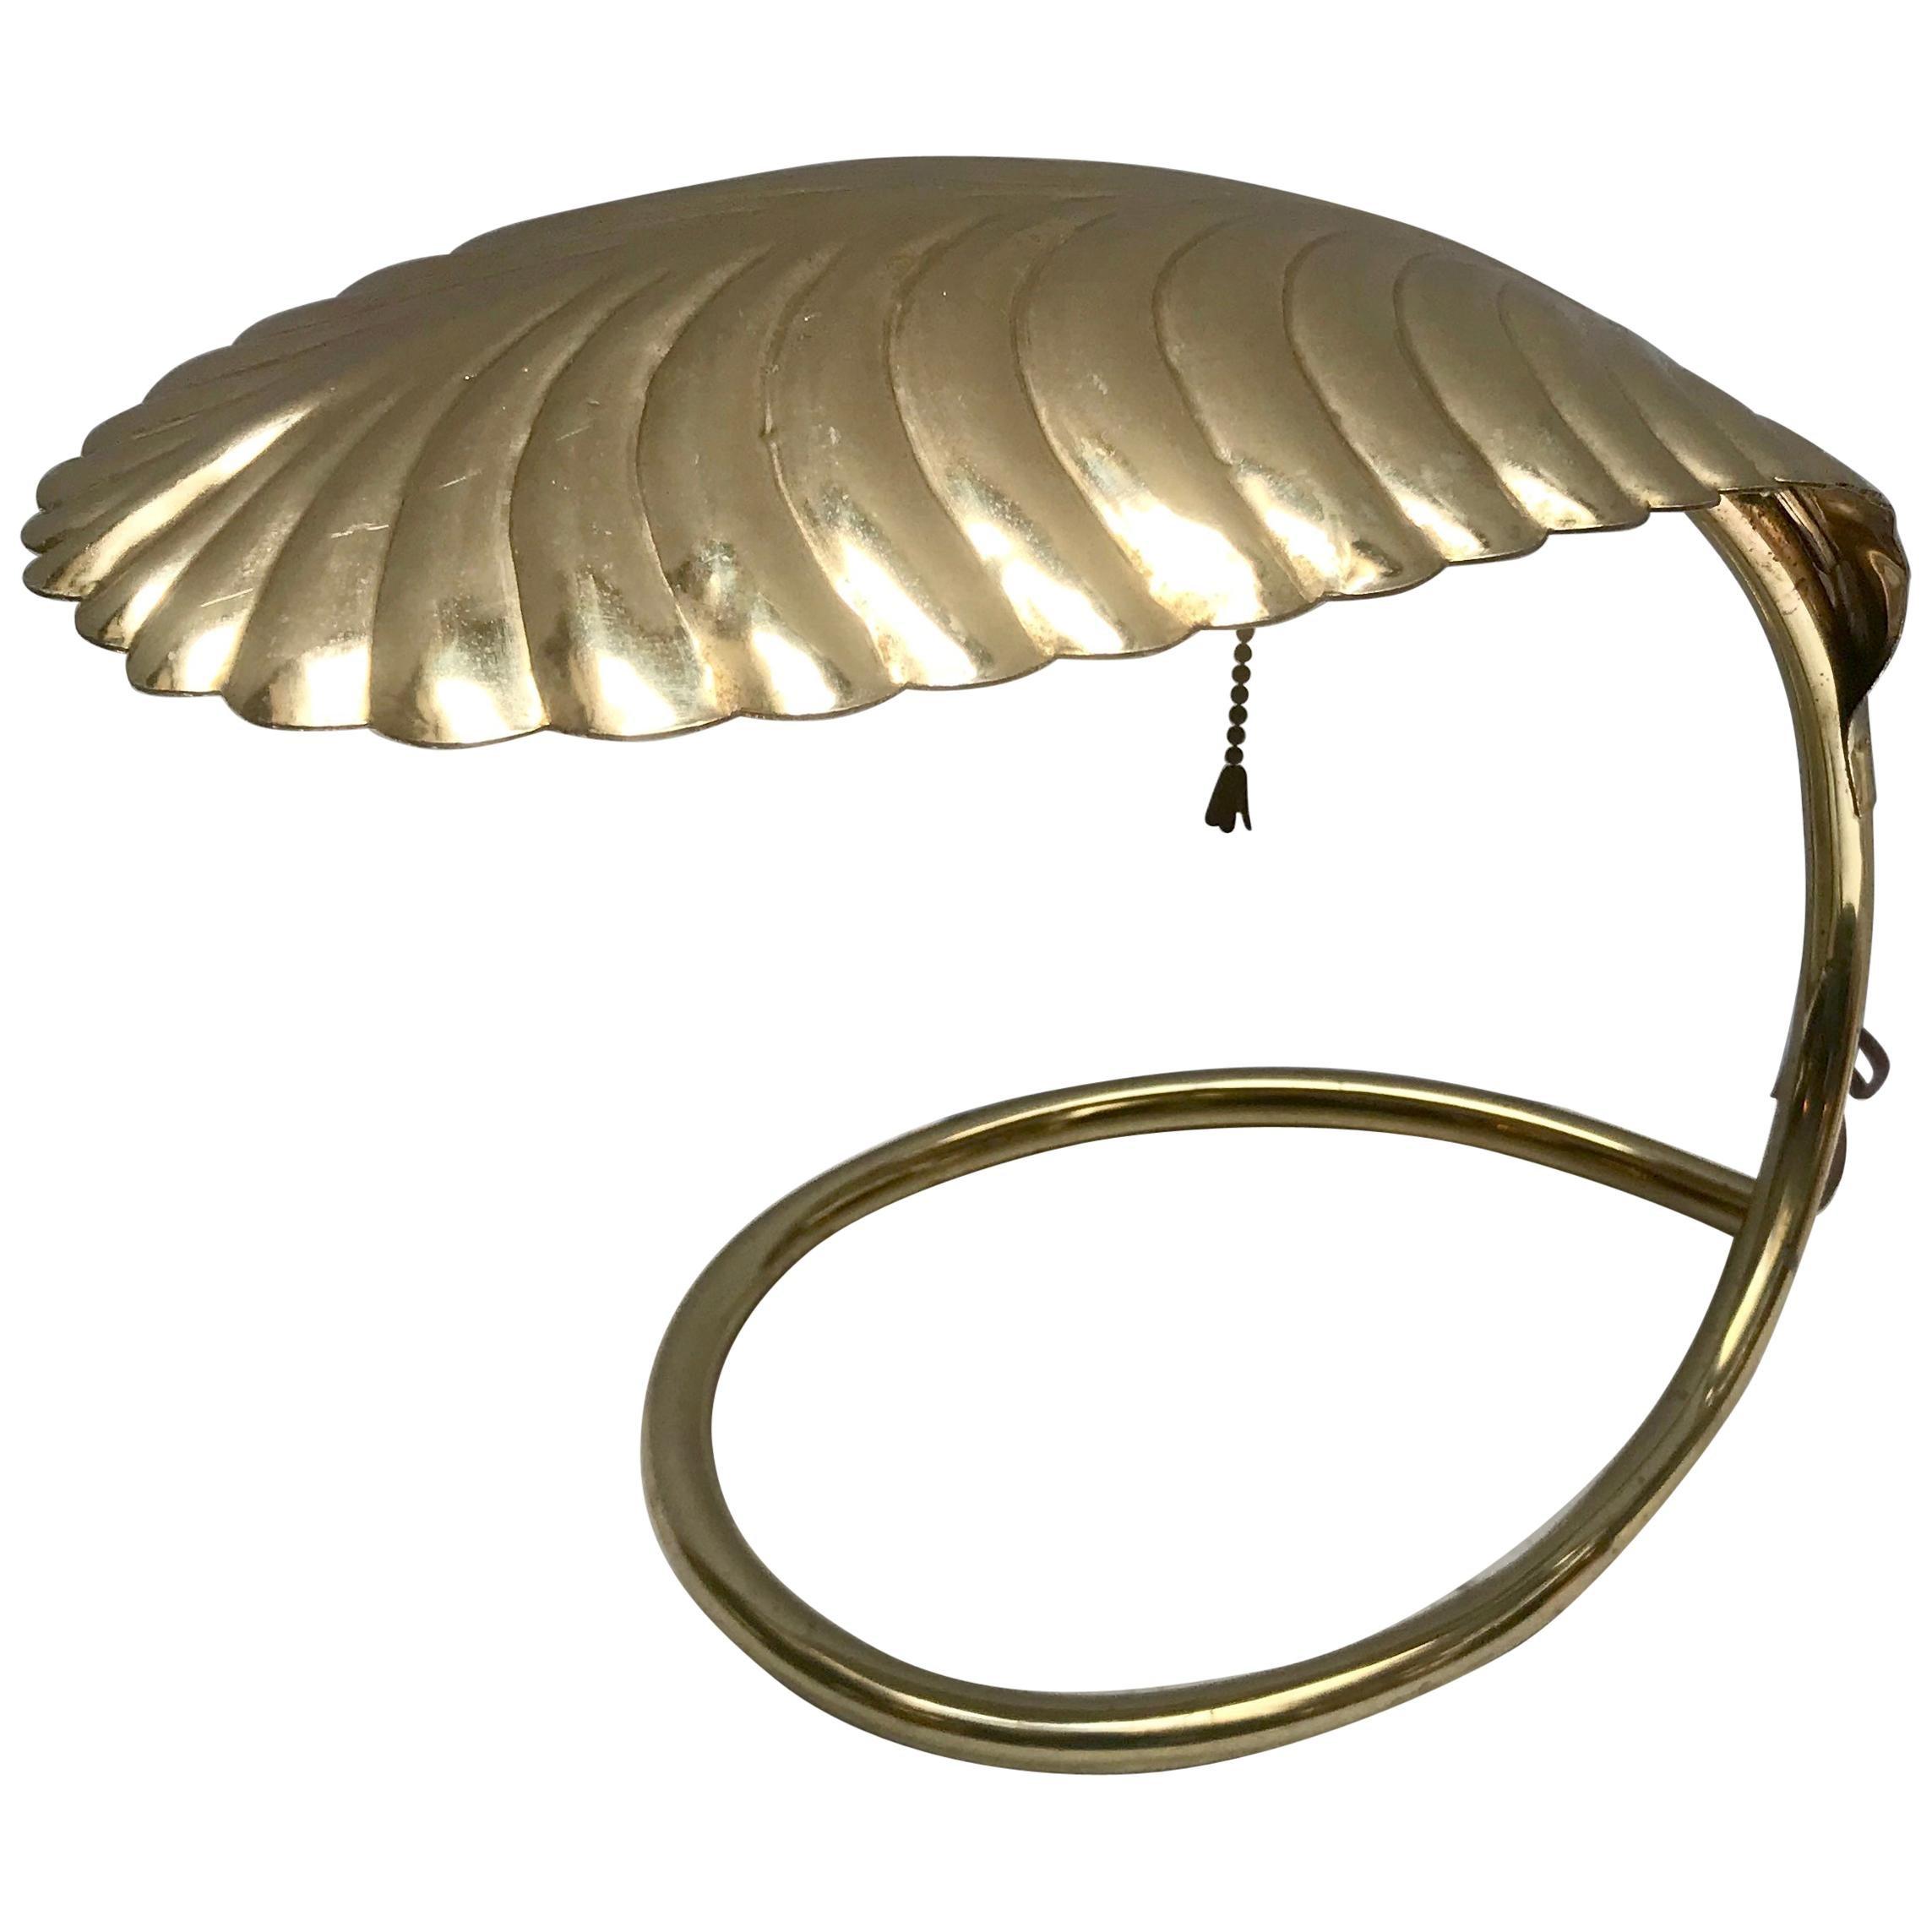 Brass Leaf Decorative Table Lamp, Tommaso Barbi, 1960